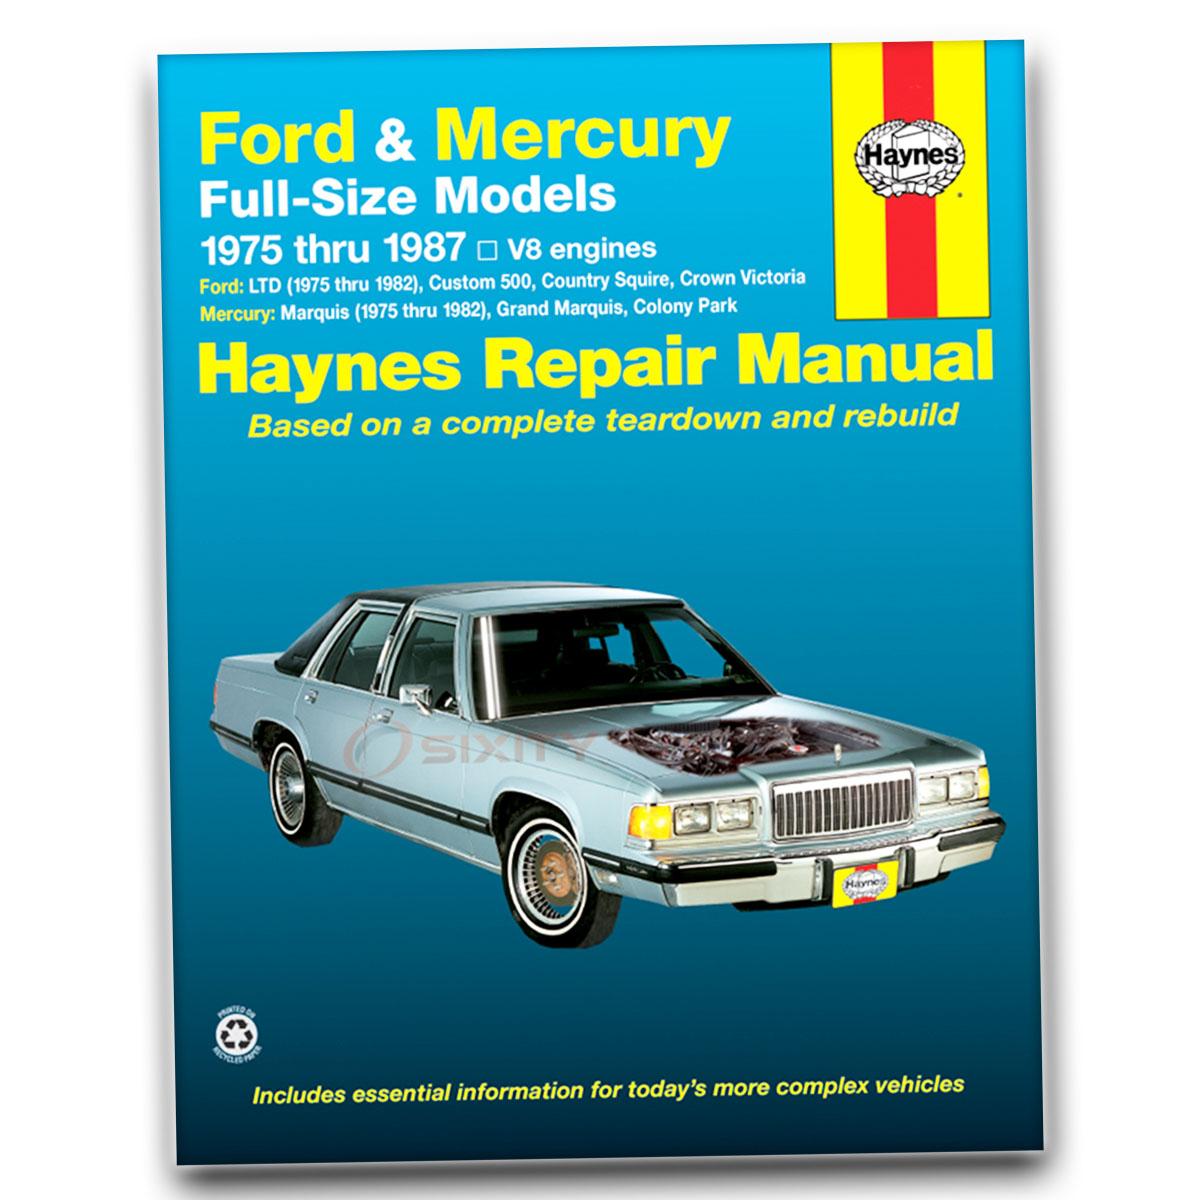 Ford Service Manuals: Haynes Ford Mercury Full Size Sedans 75-87 Repair Manual